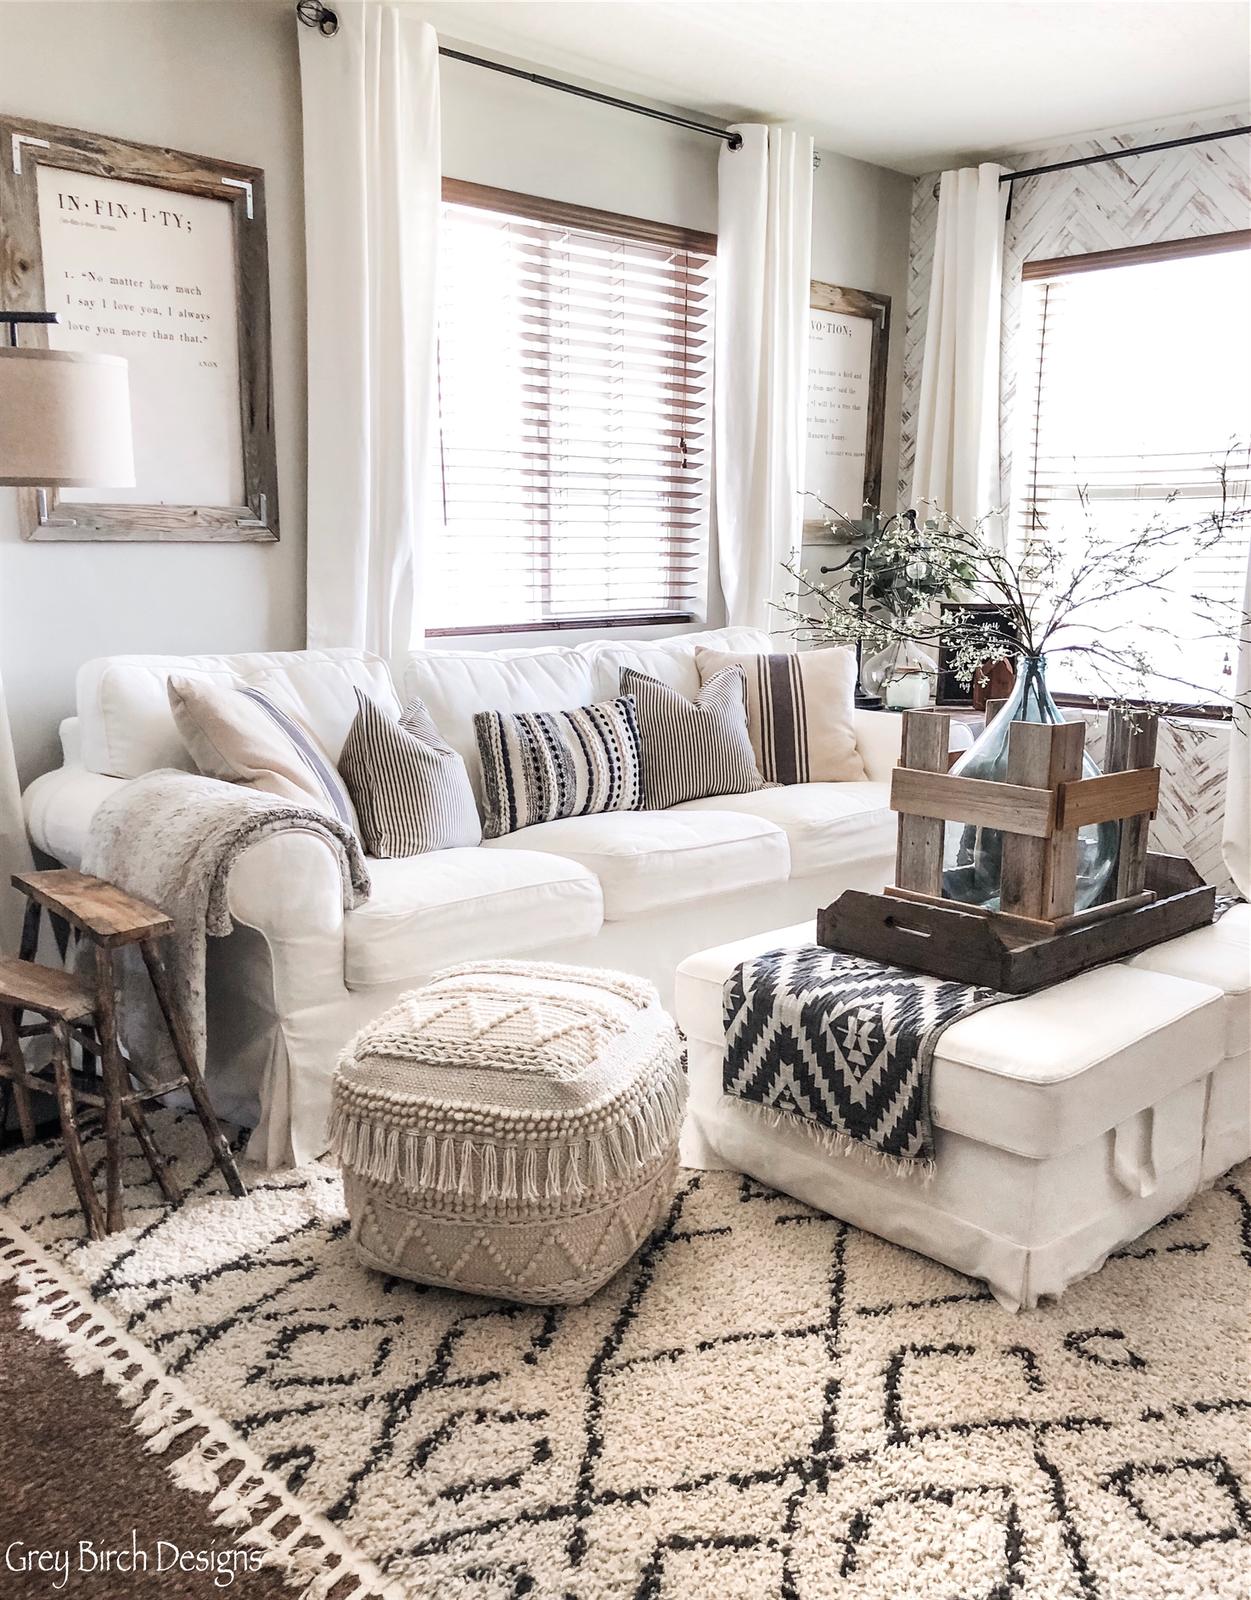 Living Room Decor Goals Grey Birch Designs Has The Dreamiest